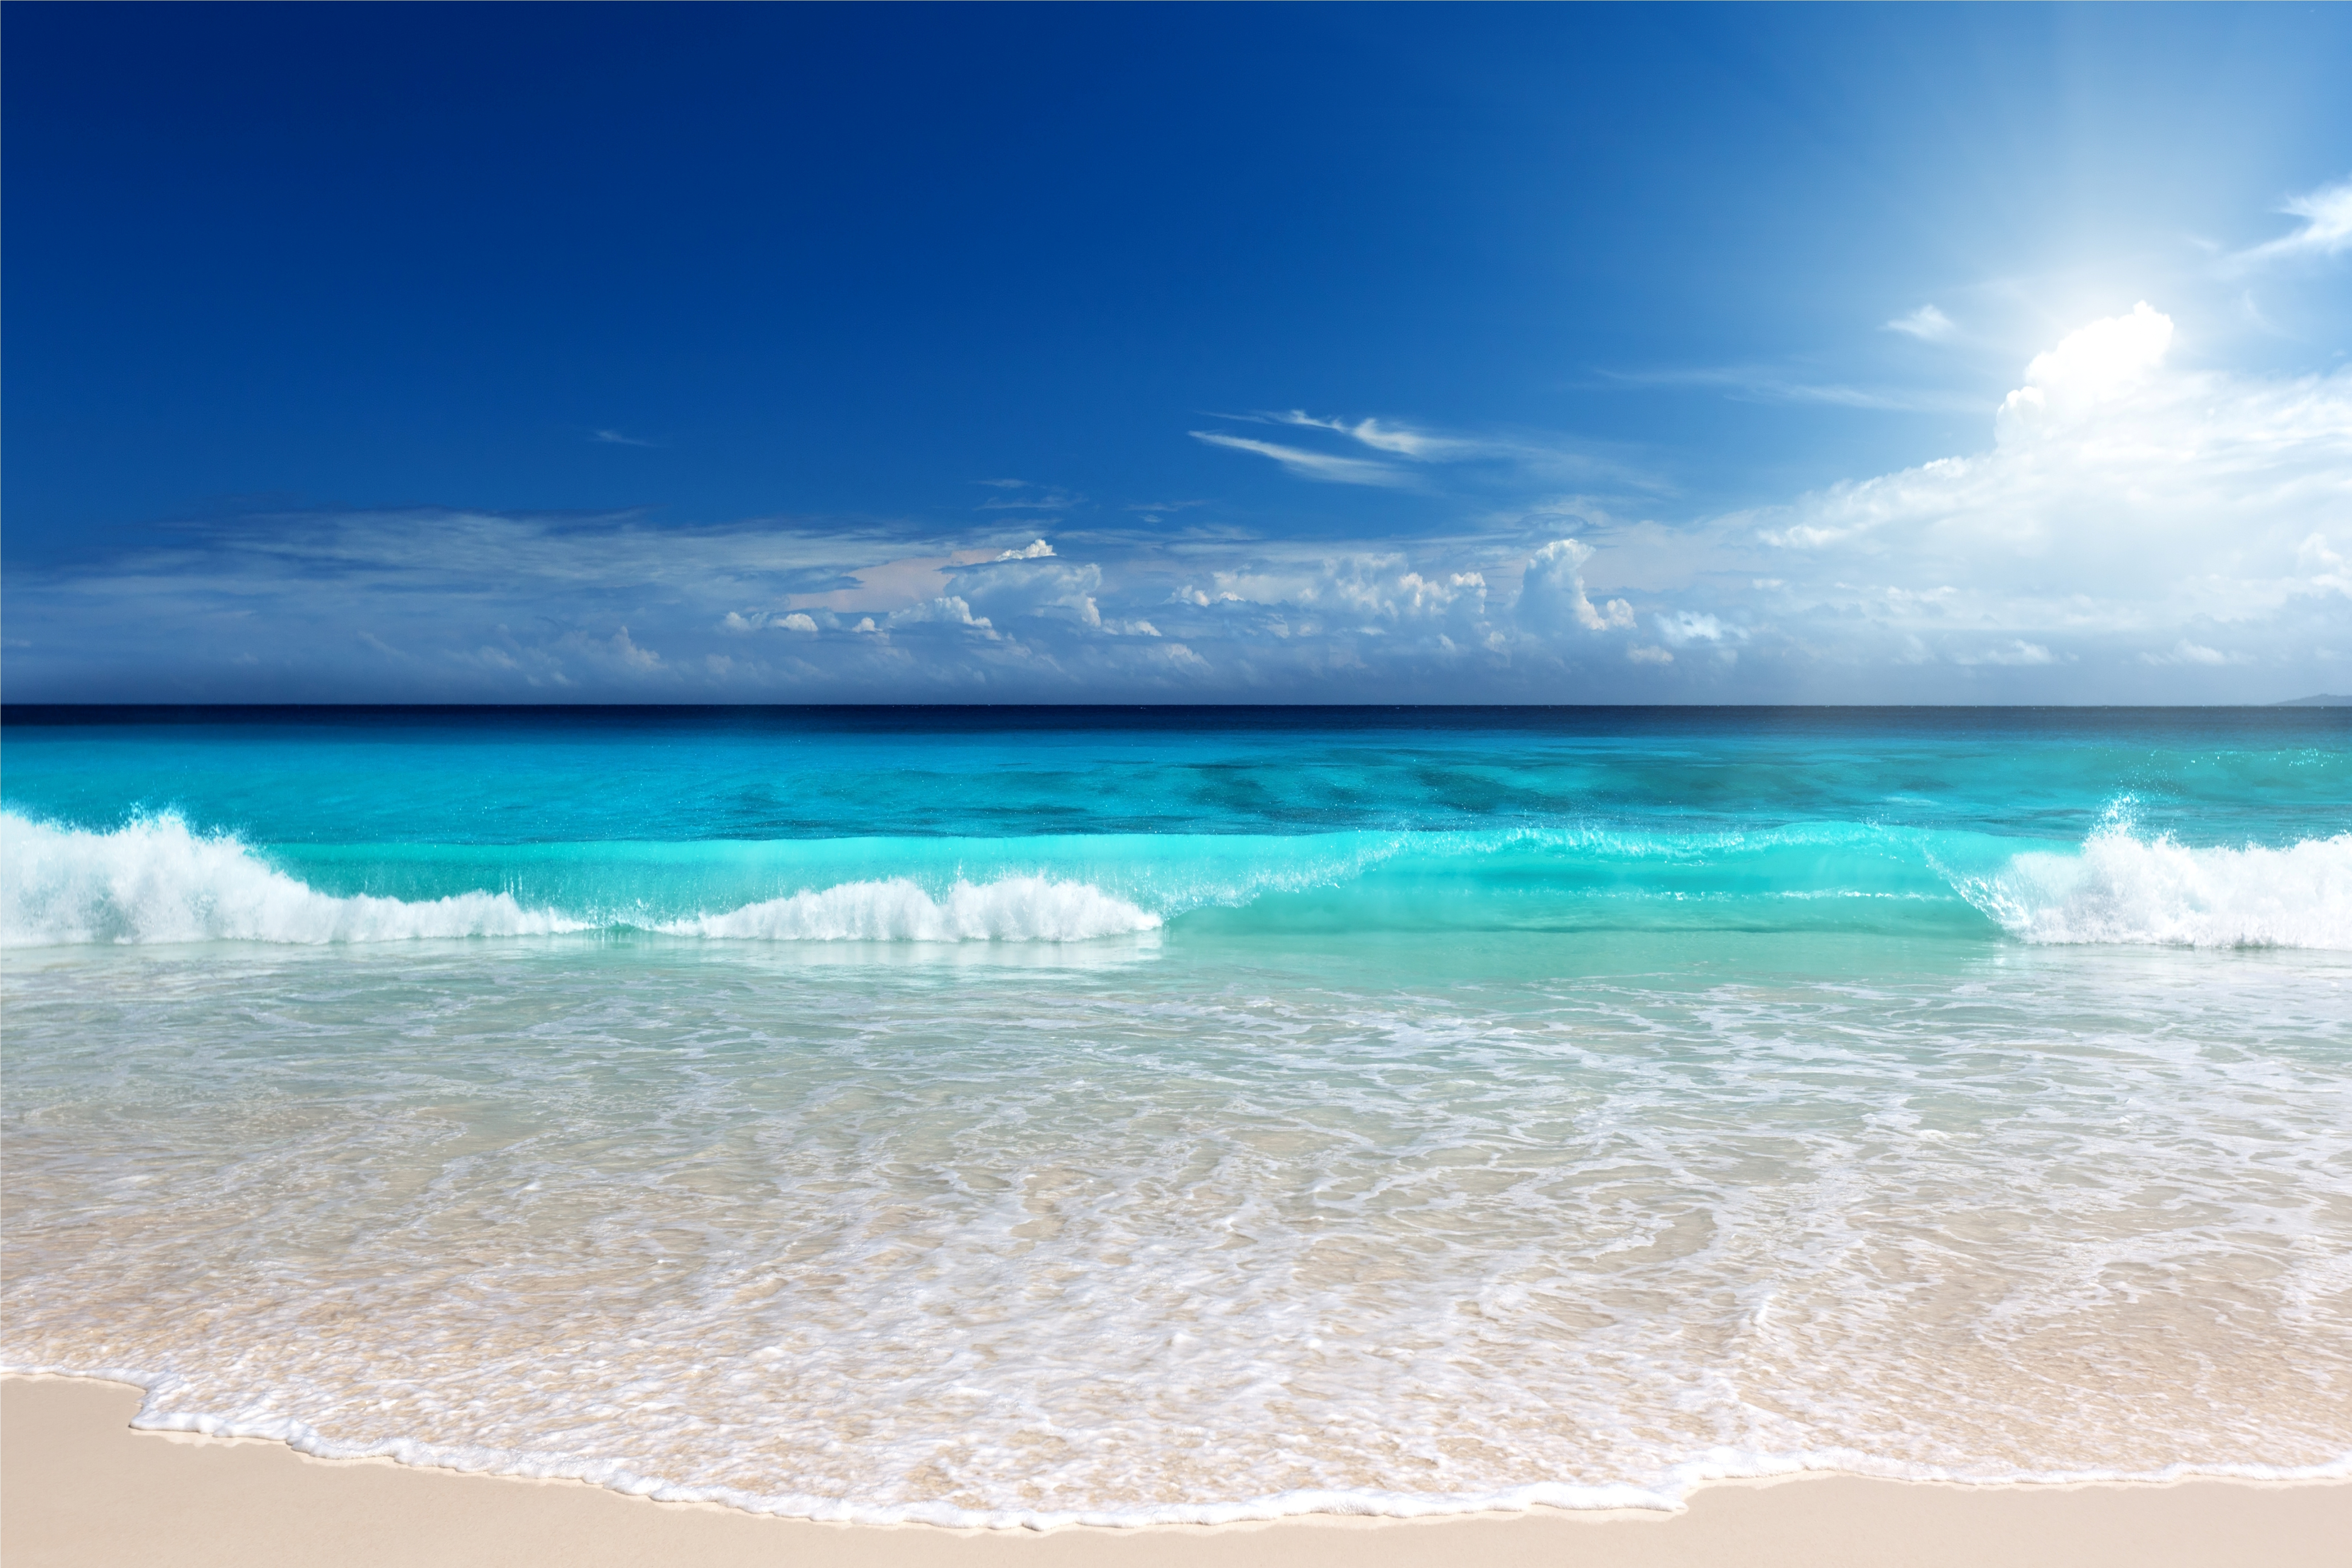 Обои на рабочий стол обои океан пляж